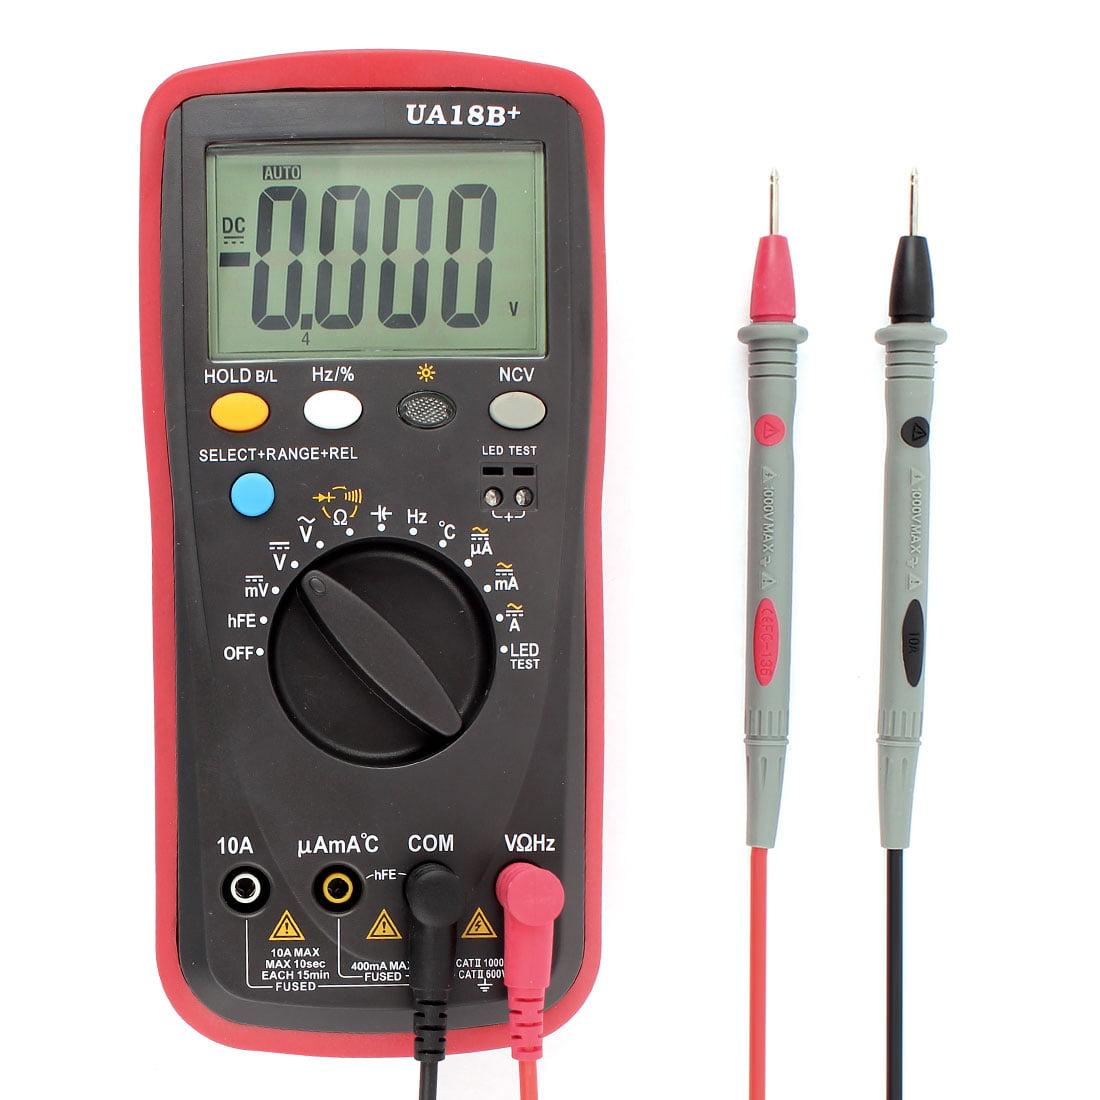 Walmart Digital Multimeter : Dc lcd tester meter voltmeter ohmmeter ammeter temp